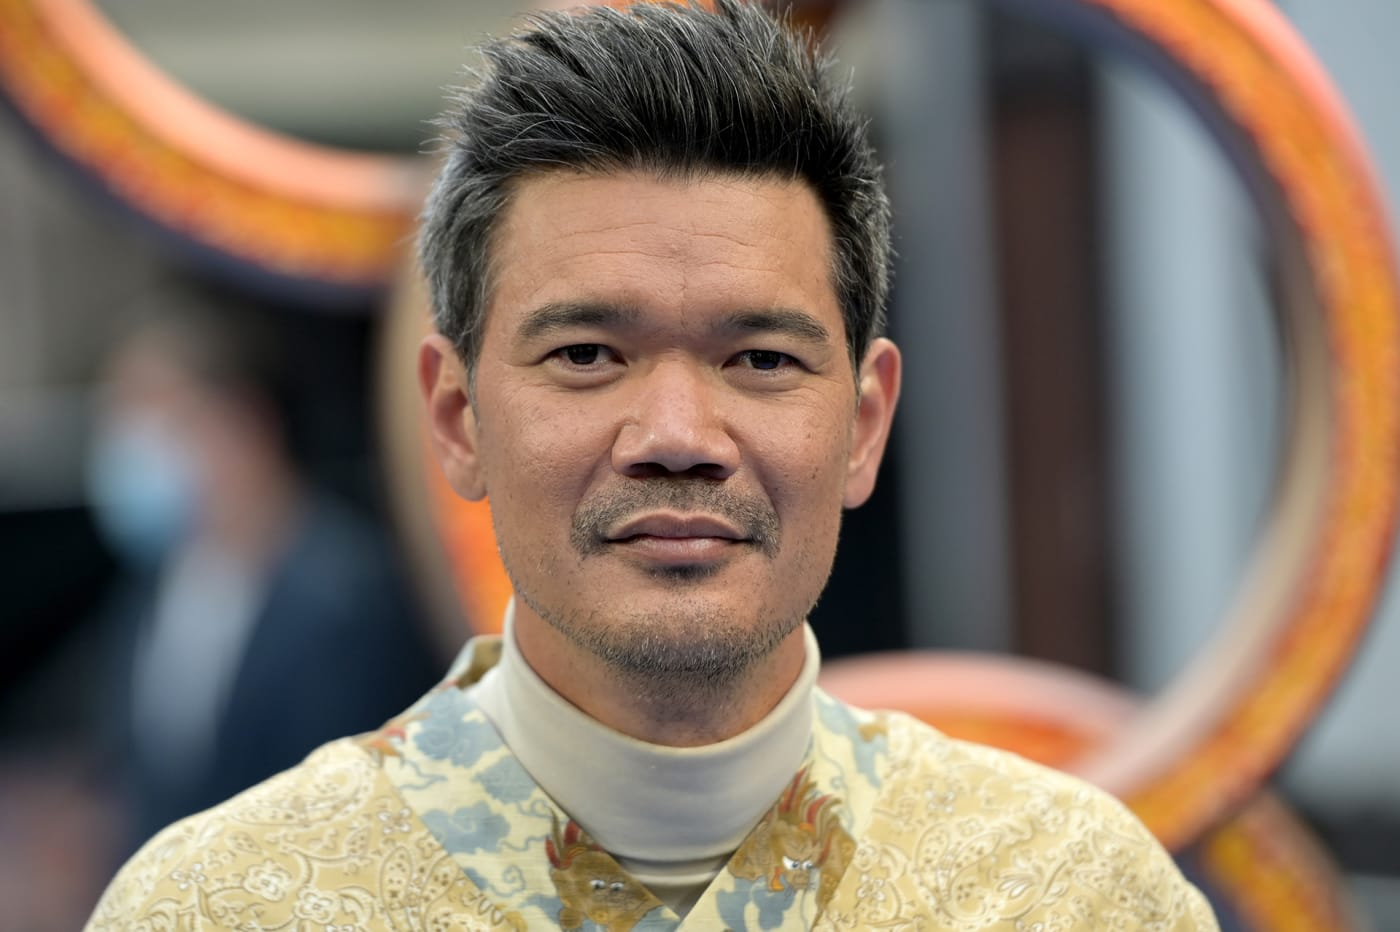 Destin Daniel Cretton attends the London 'Shang-Chi' premiere screening